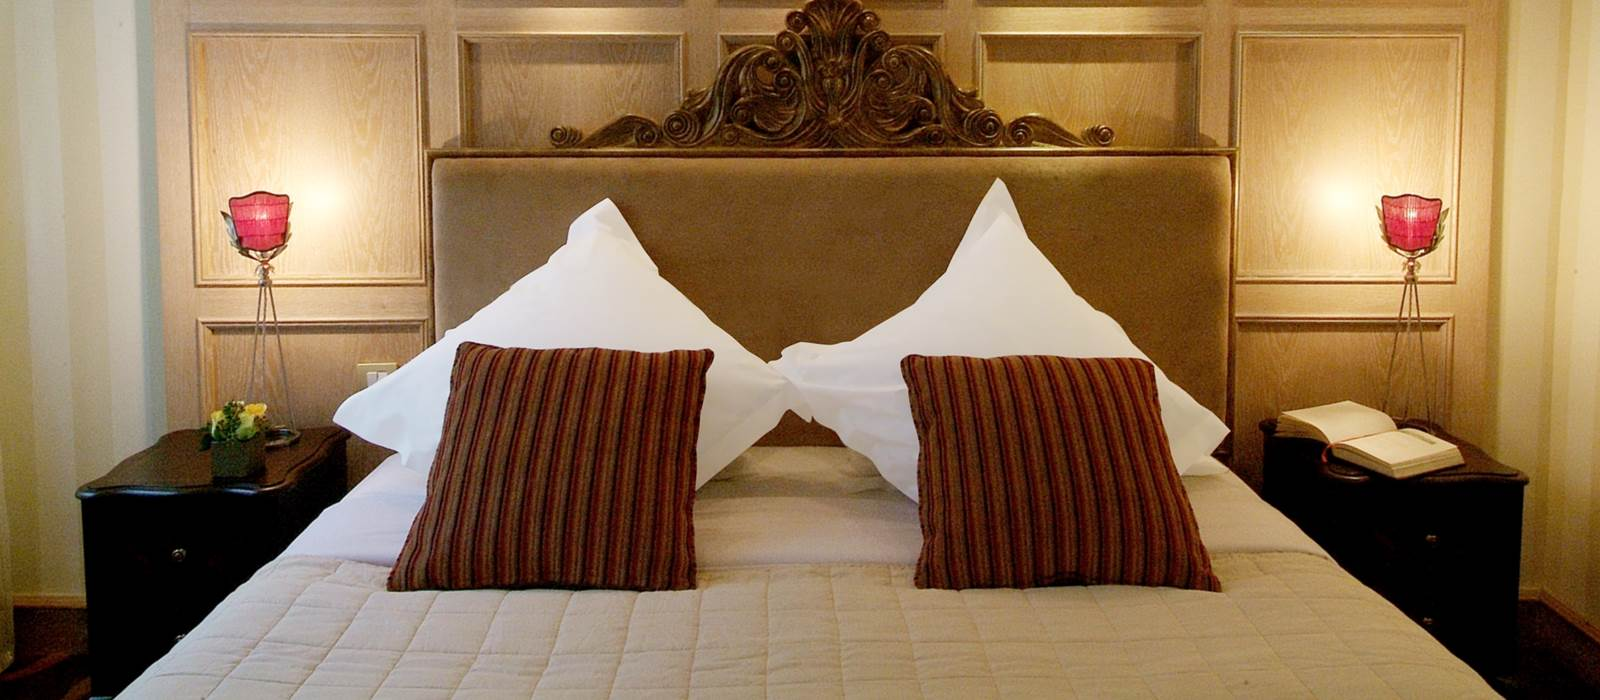 chambres d 39 h tel de luxe amarante champs elys es paris. Black Bedroom Furniture Sets. Home Design Ideas